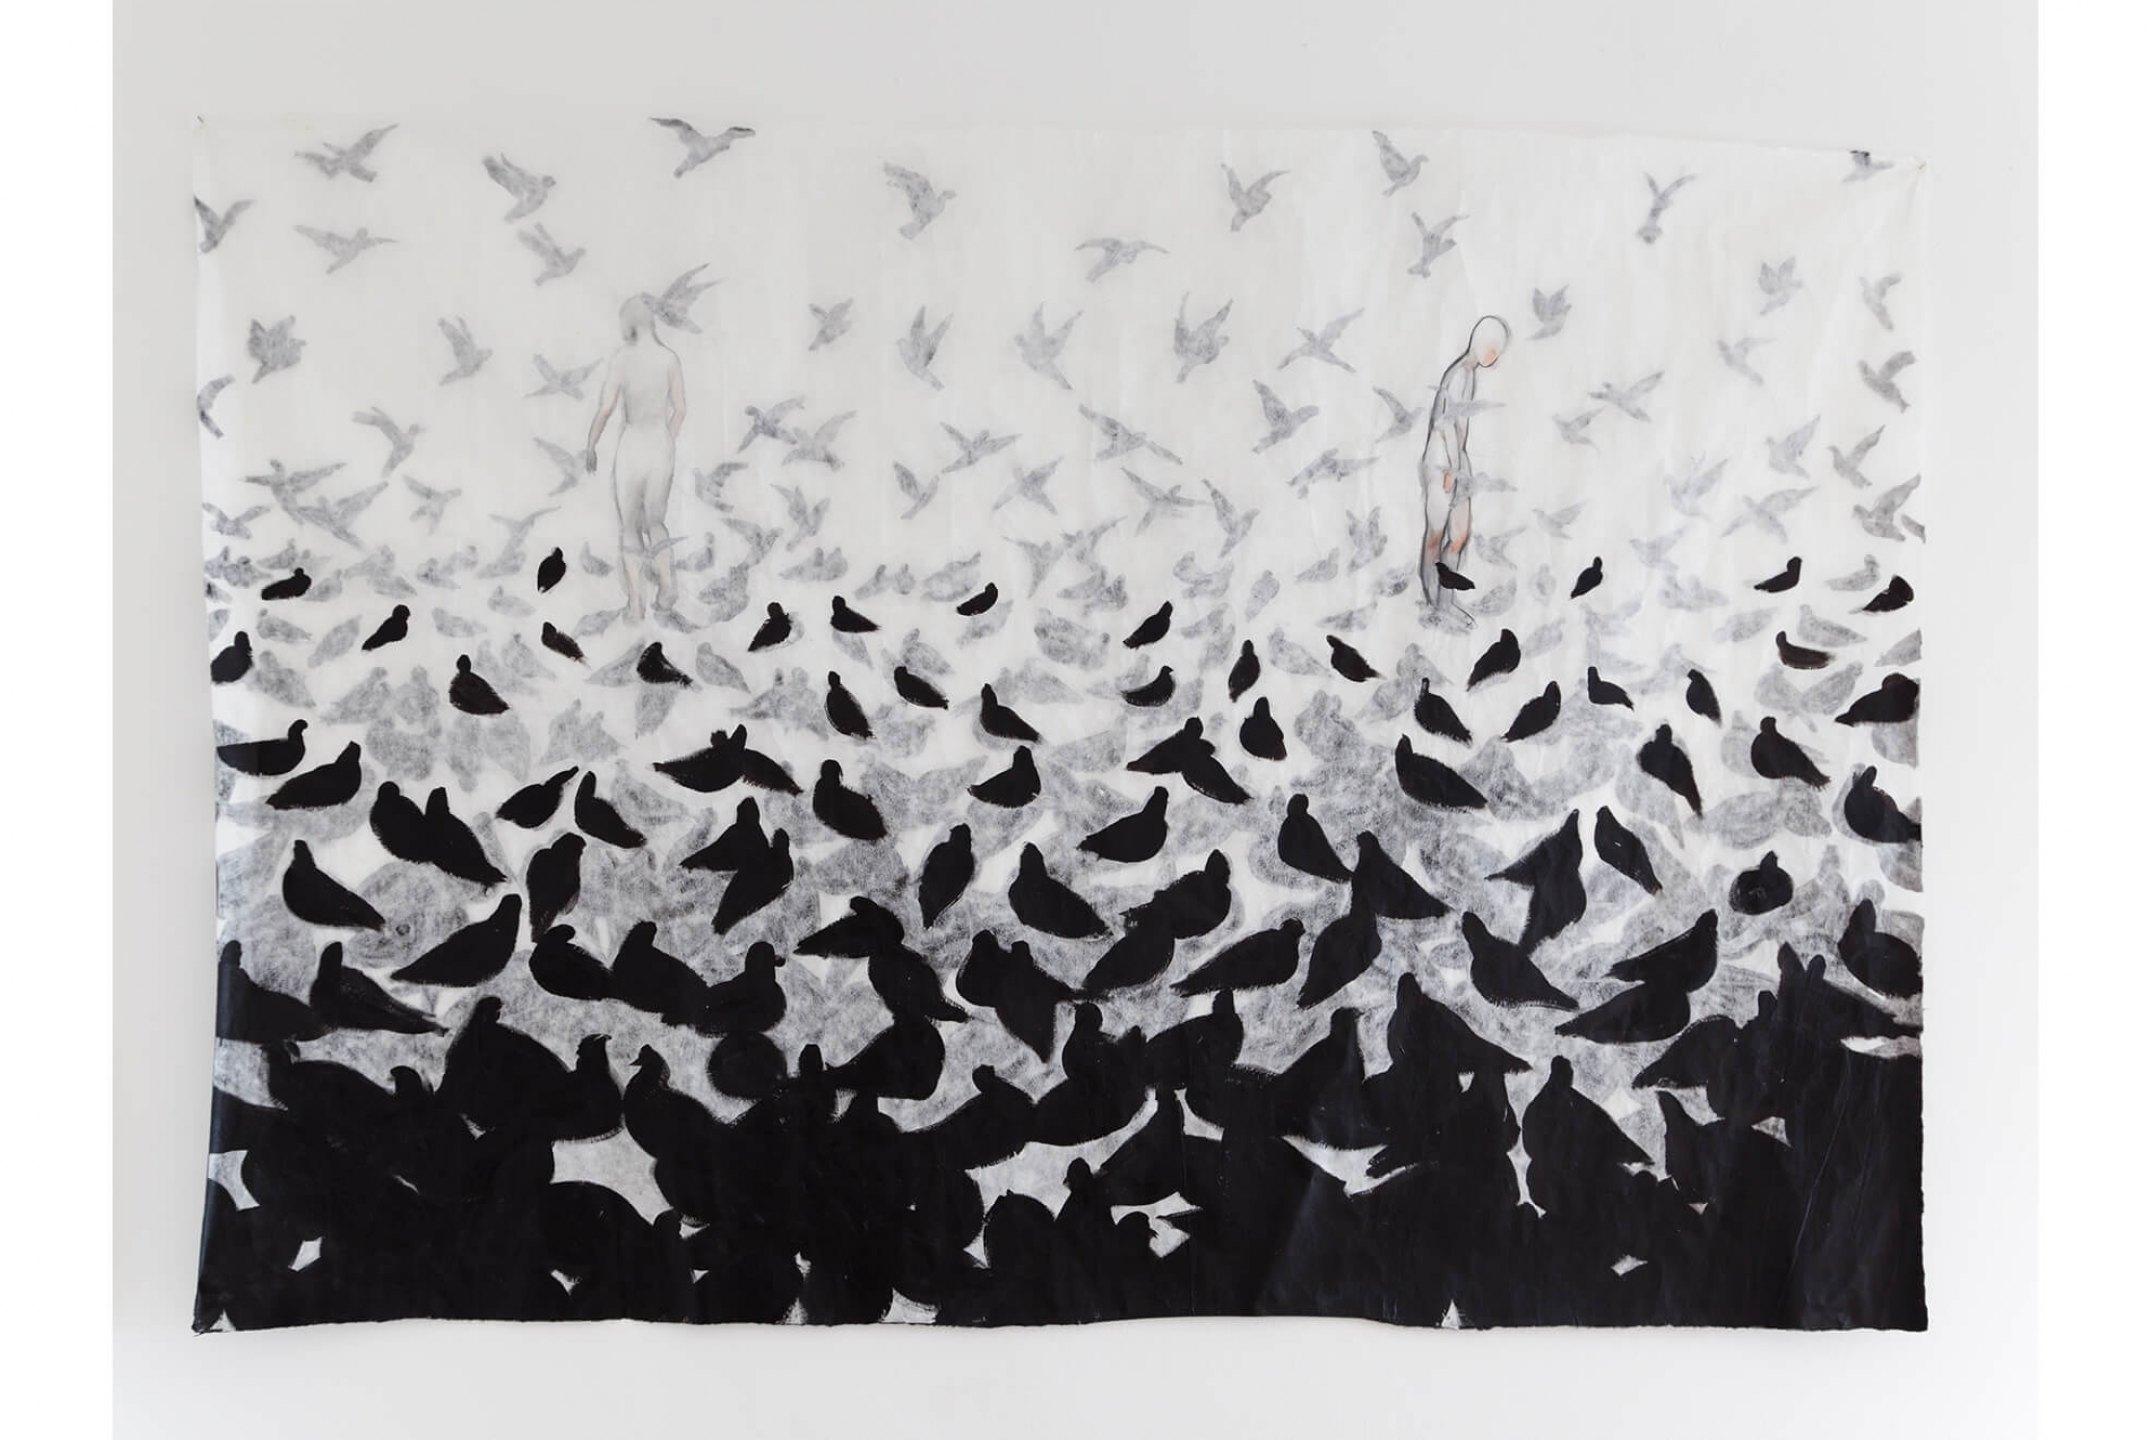 Marina Pererz Simão, <em>Black Birds</em>, 2009, acrylic and colored pencil on paper, 58, 2× 83,8 inches - Mendes Wood DM